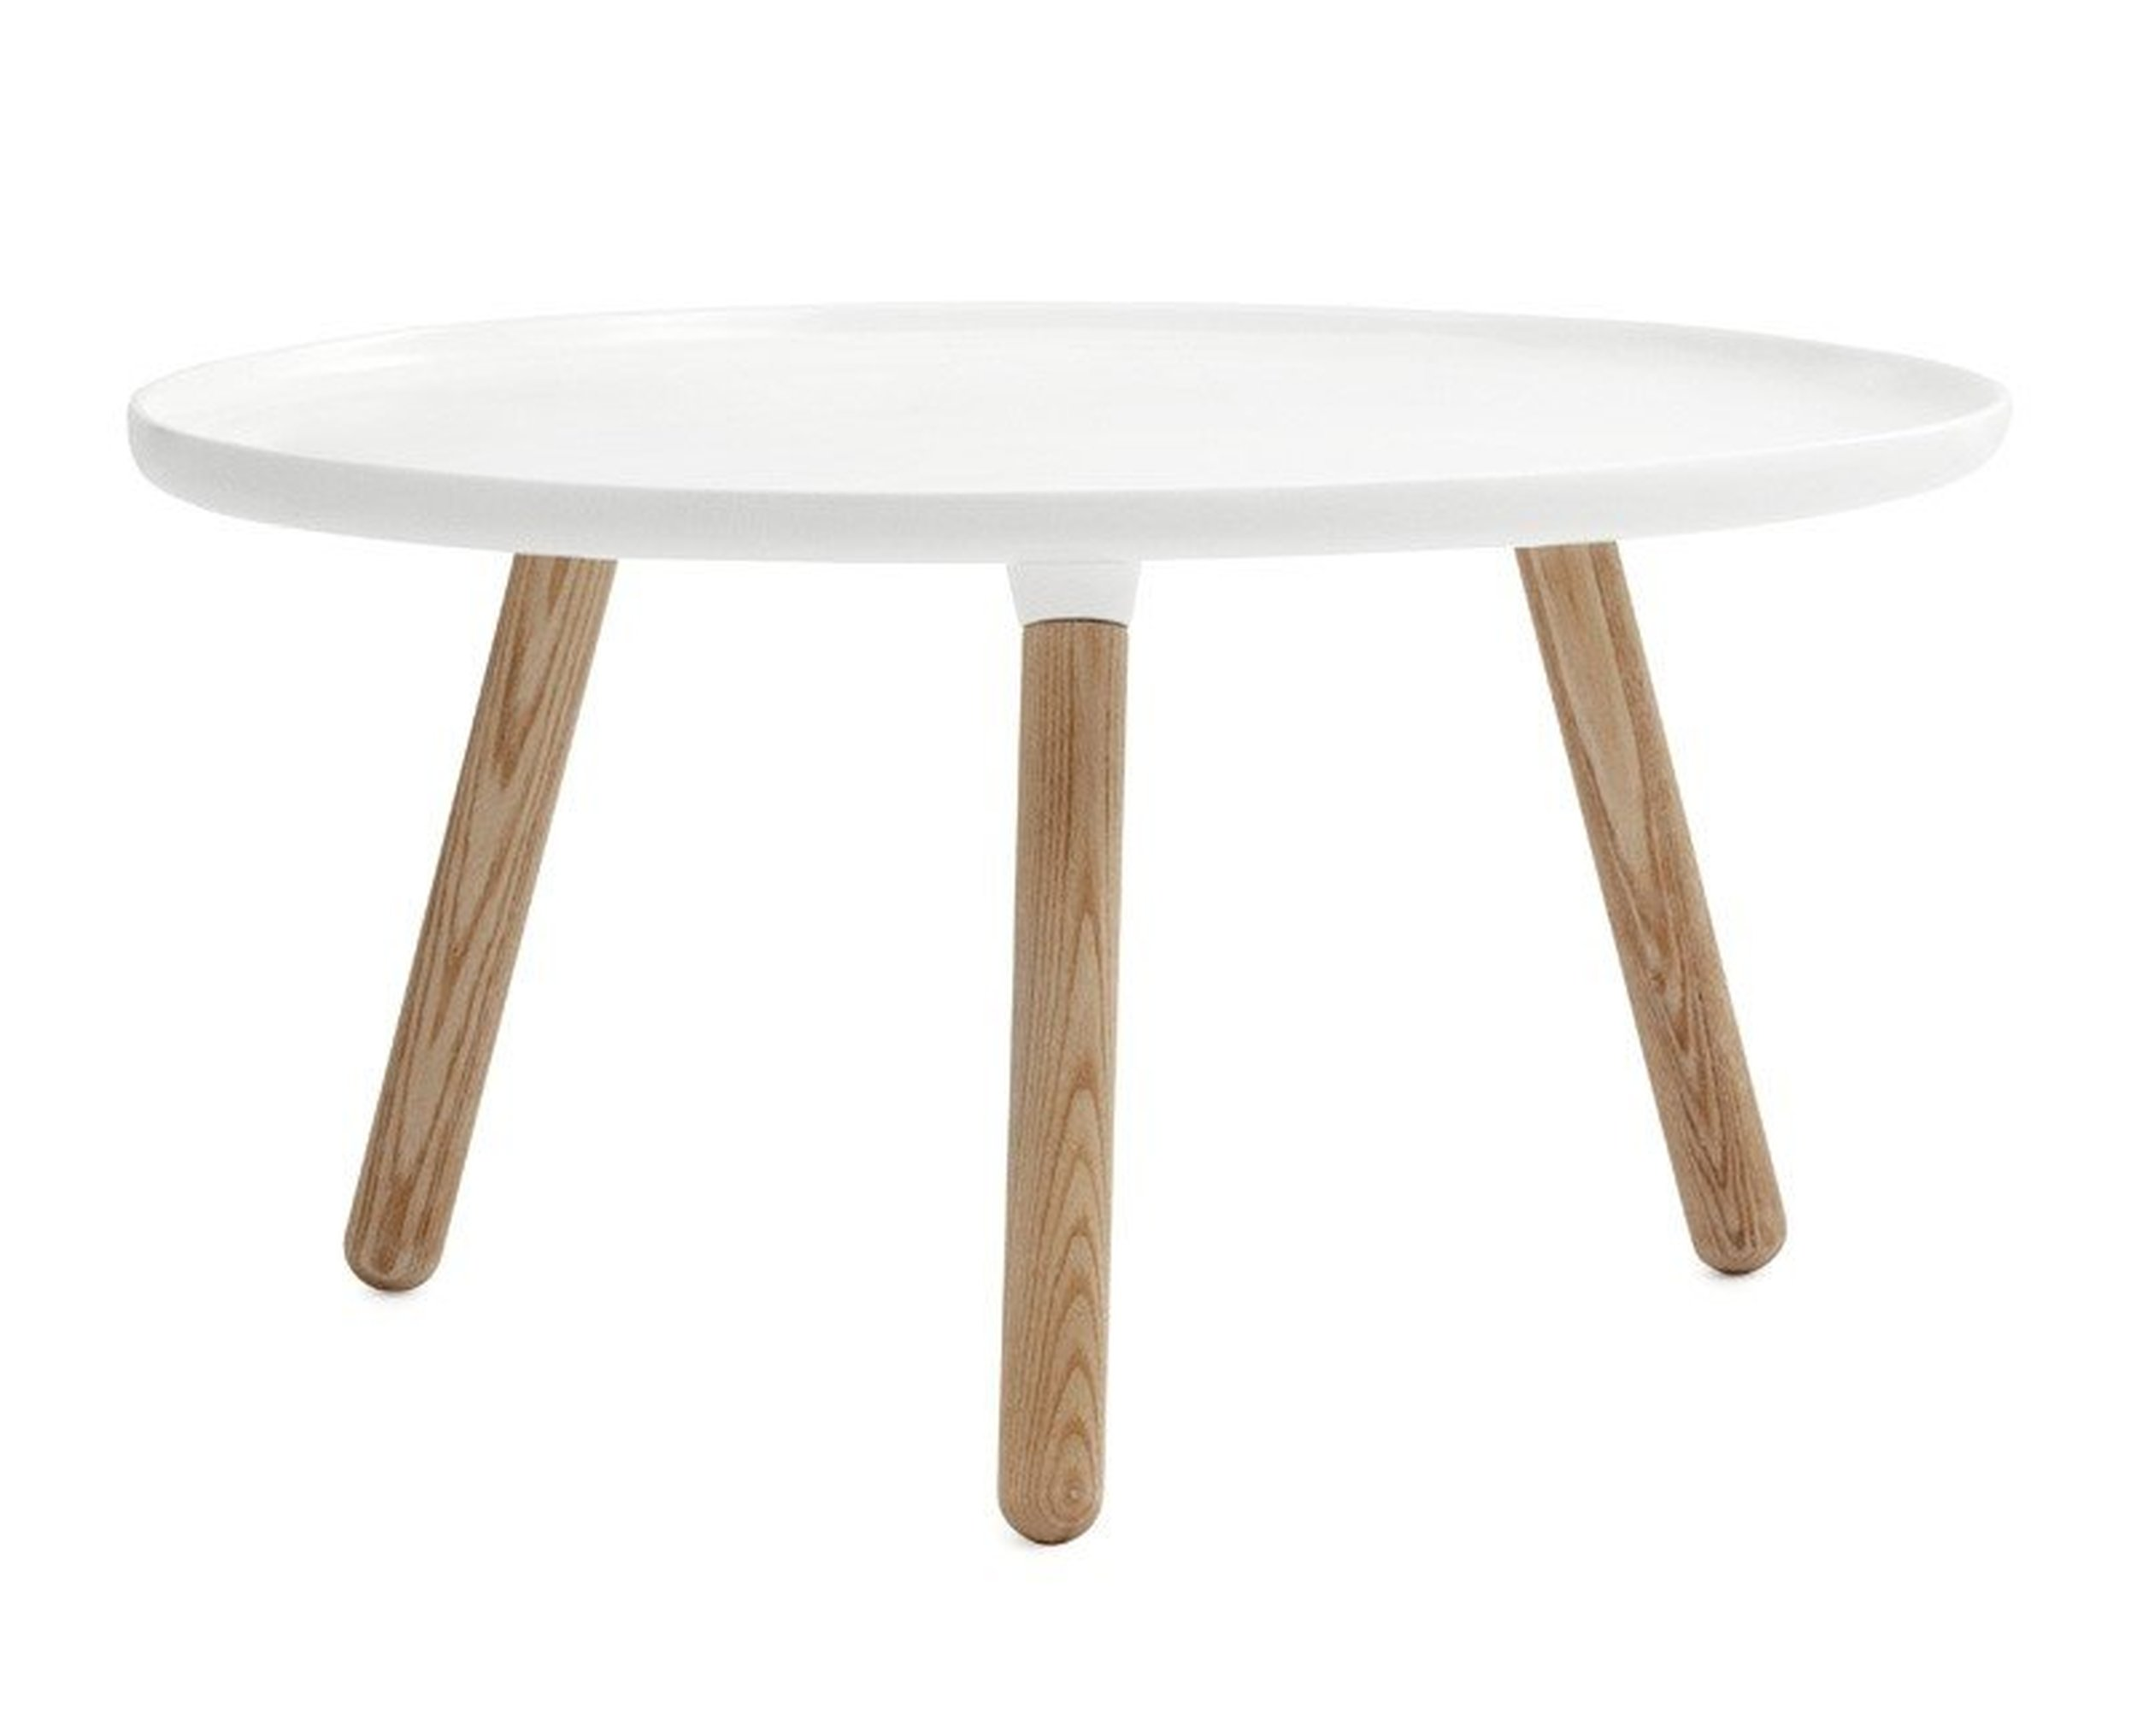 stolik tablo kwadratowy normann copenhagen. Black Bedroom Furniture Sets. Home Design Ideas